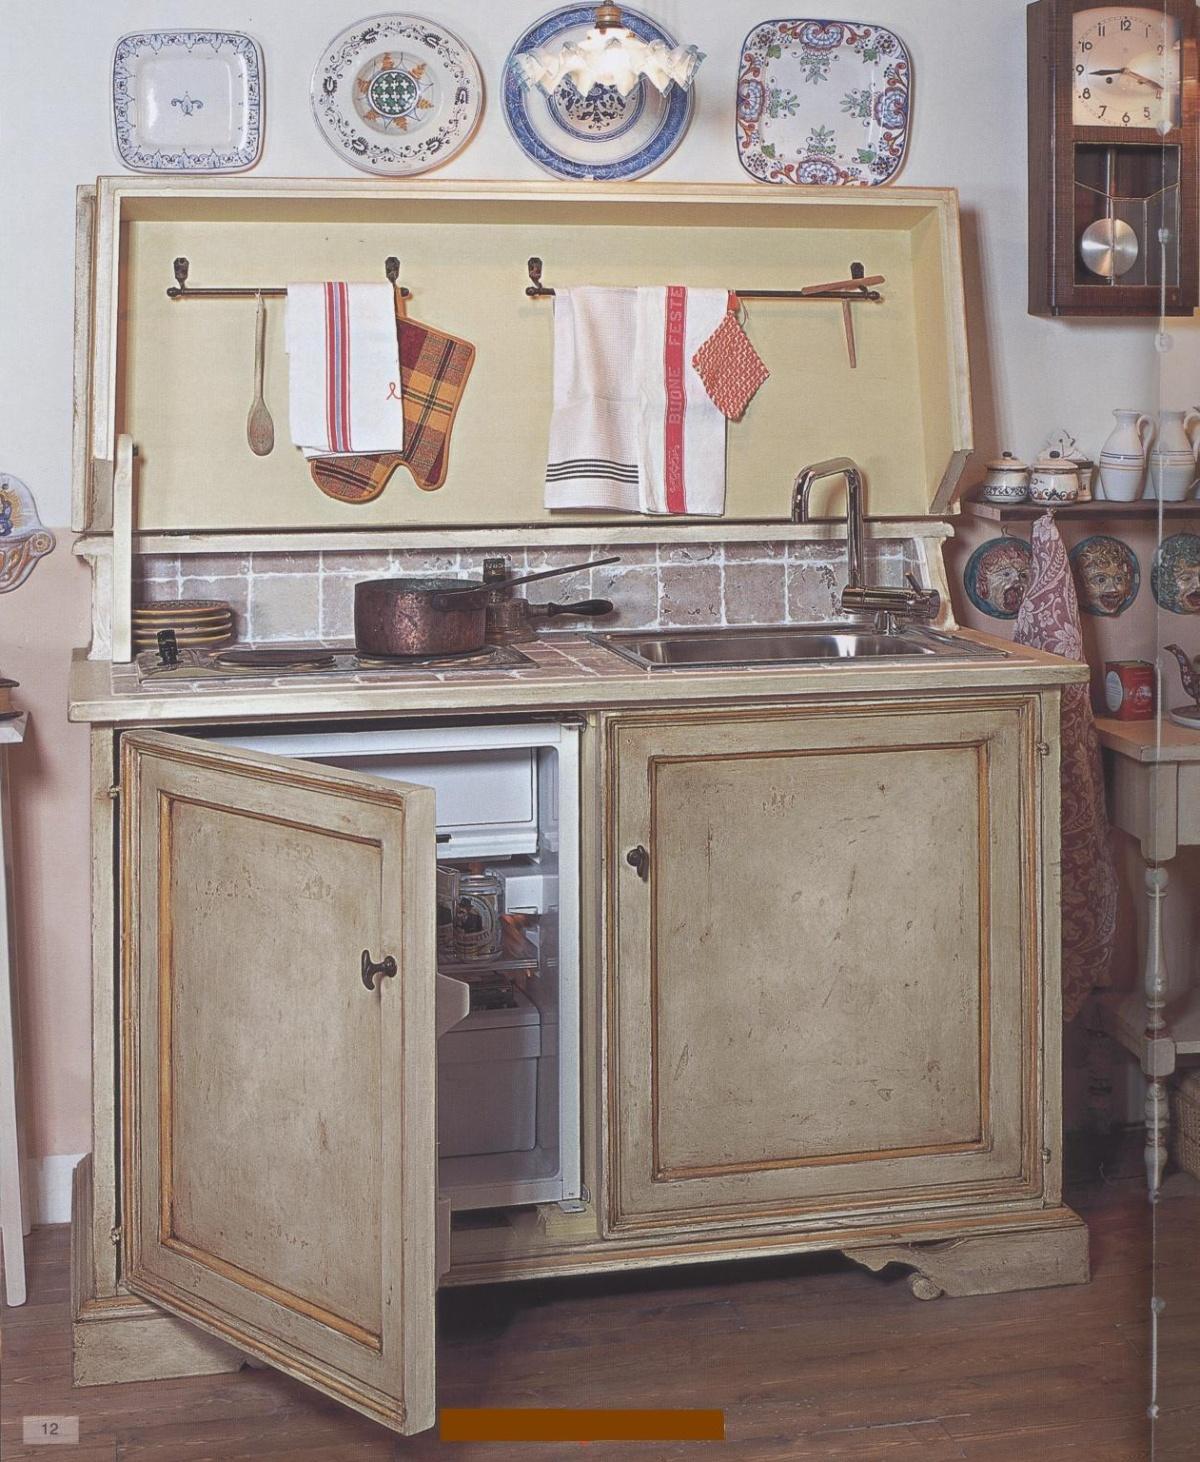 Cucine mobilificio in piemonte for Credenza cucina